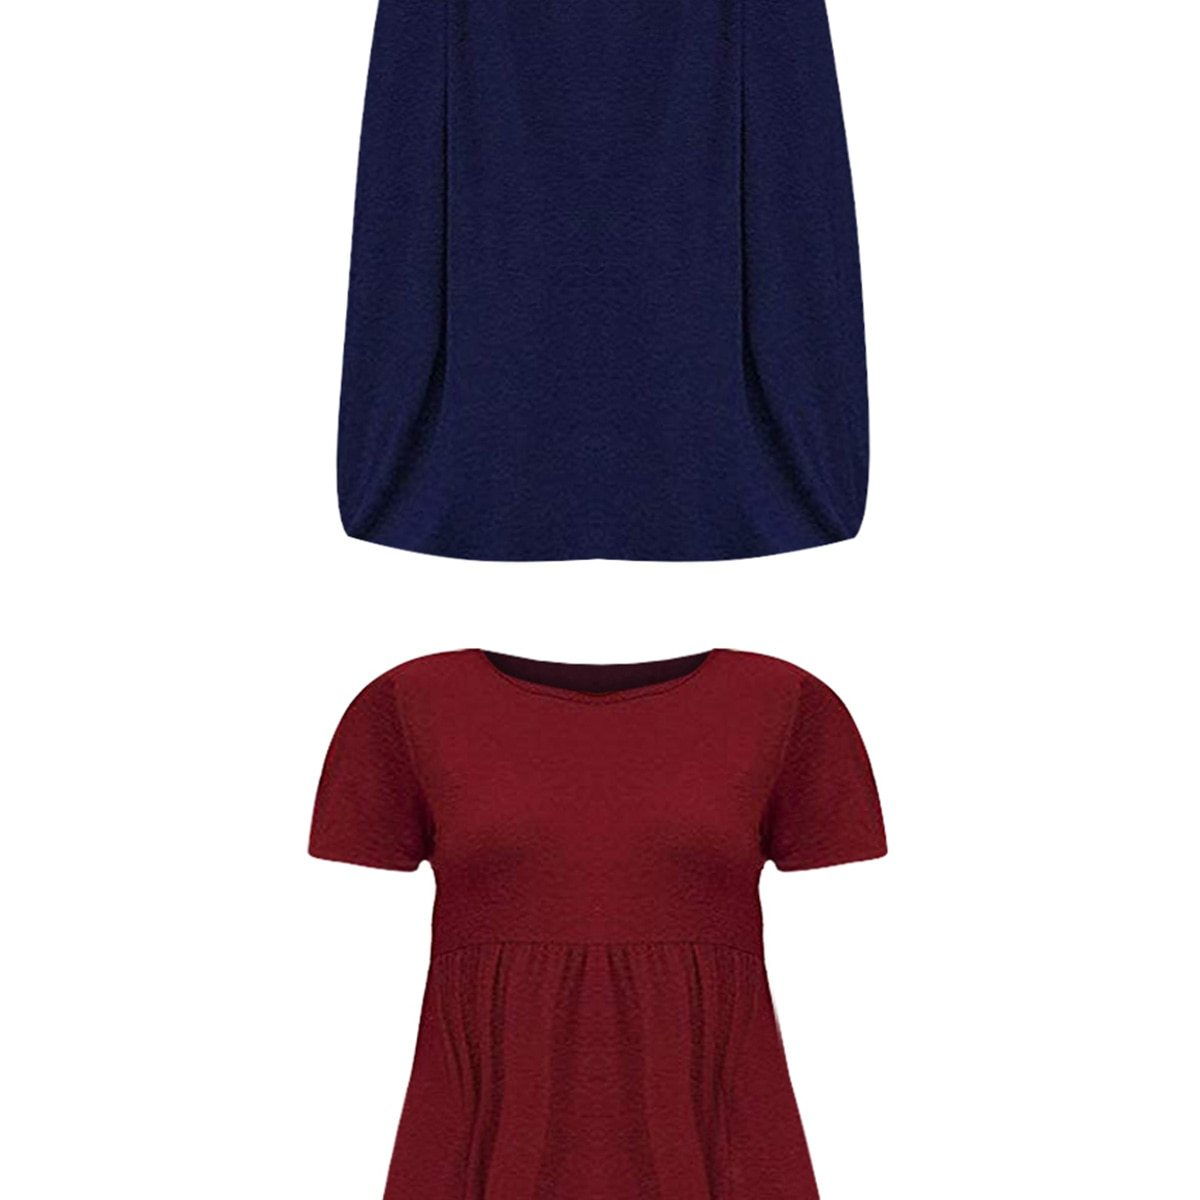 Maternity Dress Solid Color Loose Comfy Mom Dress image 5